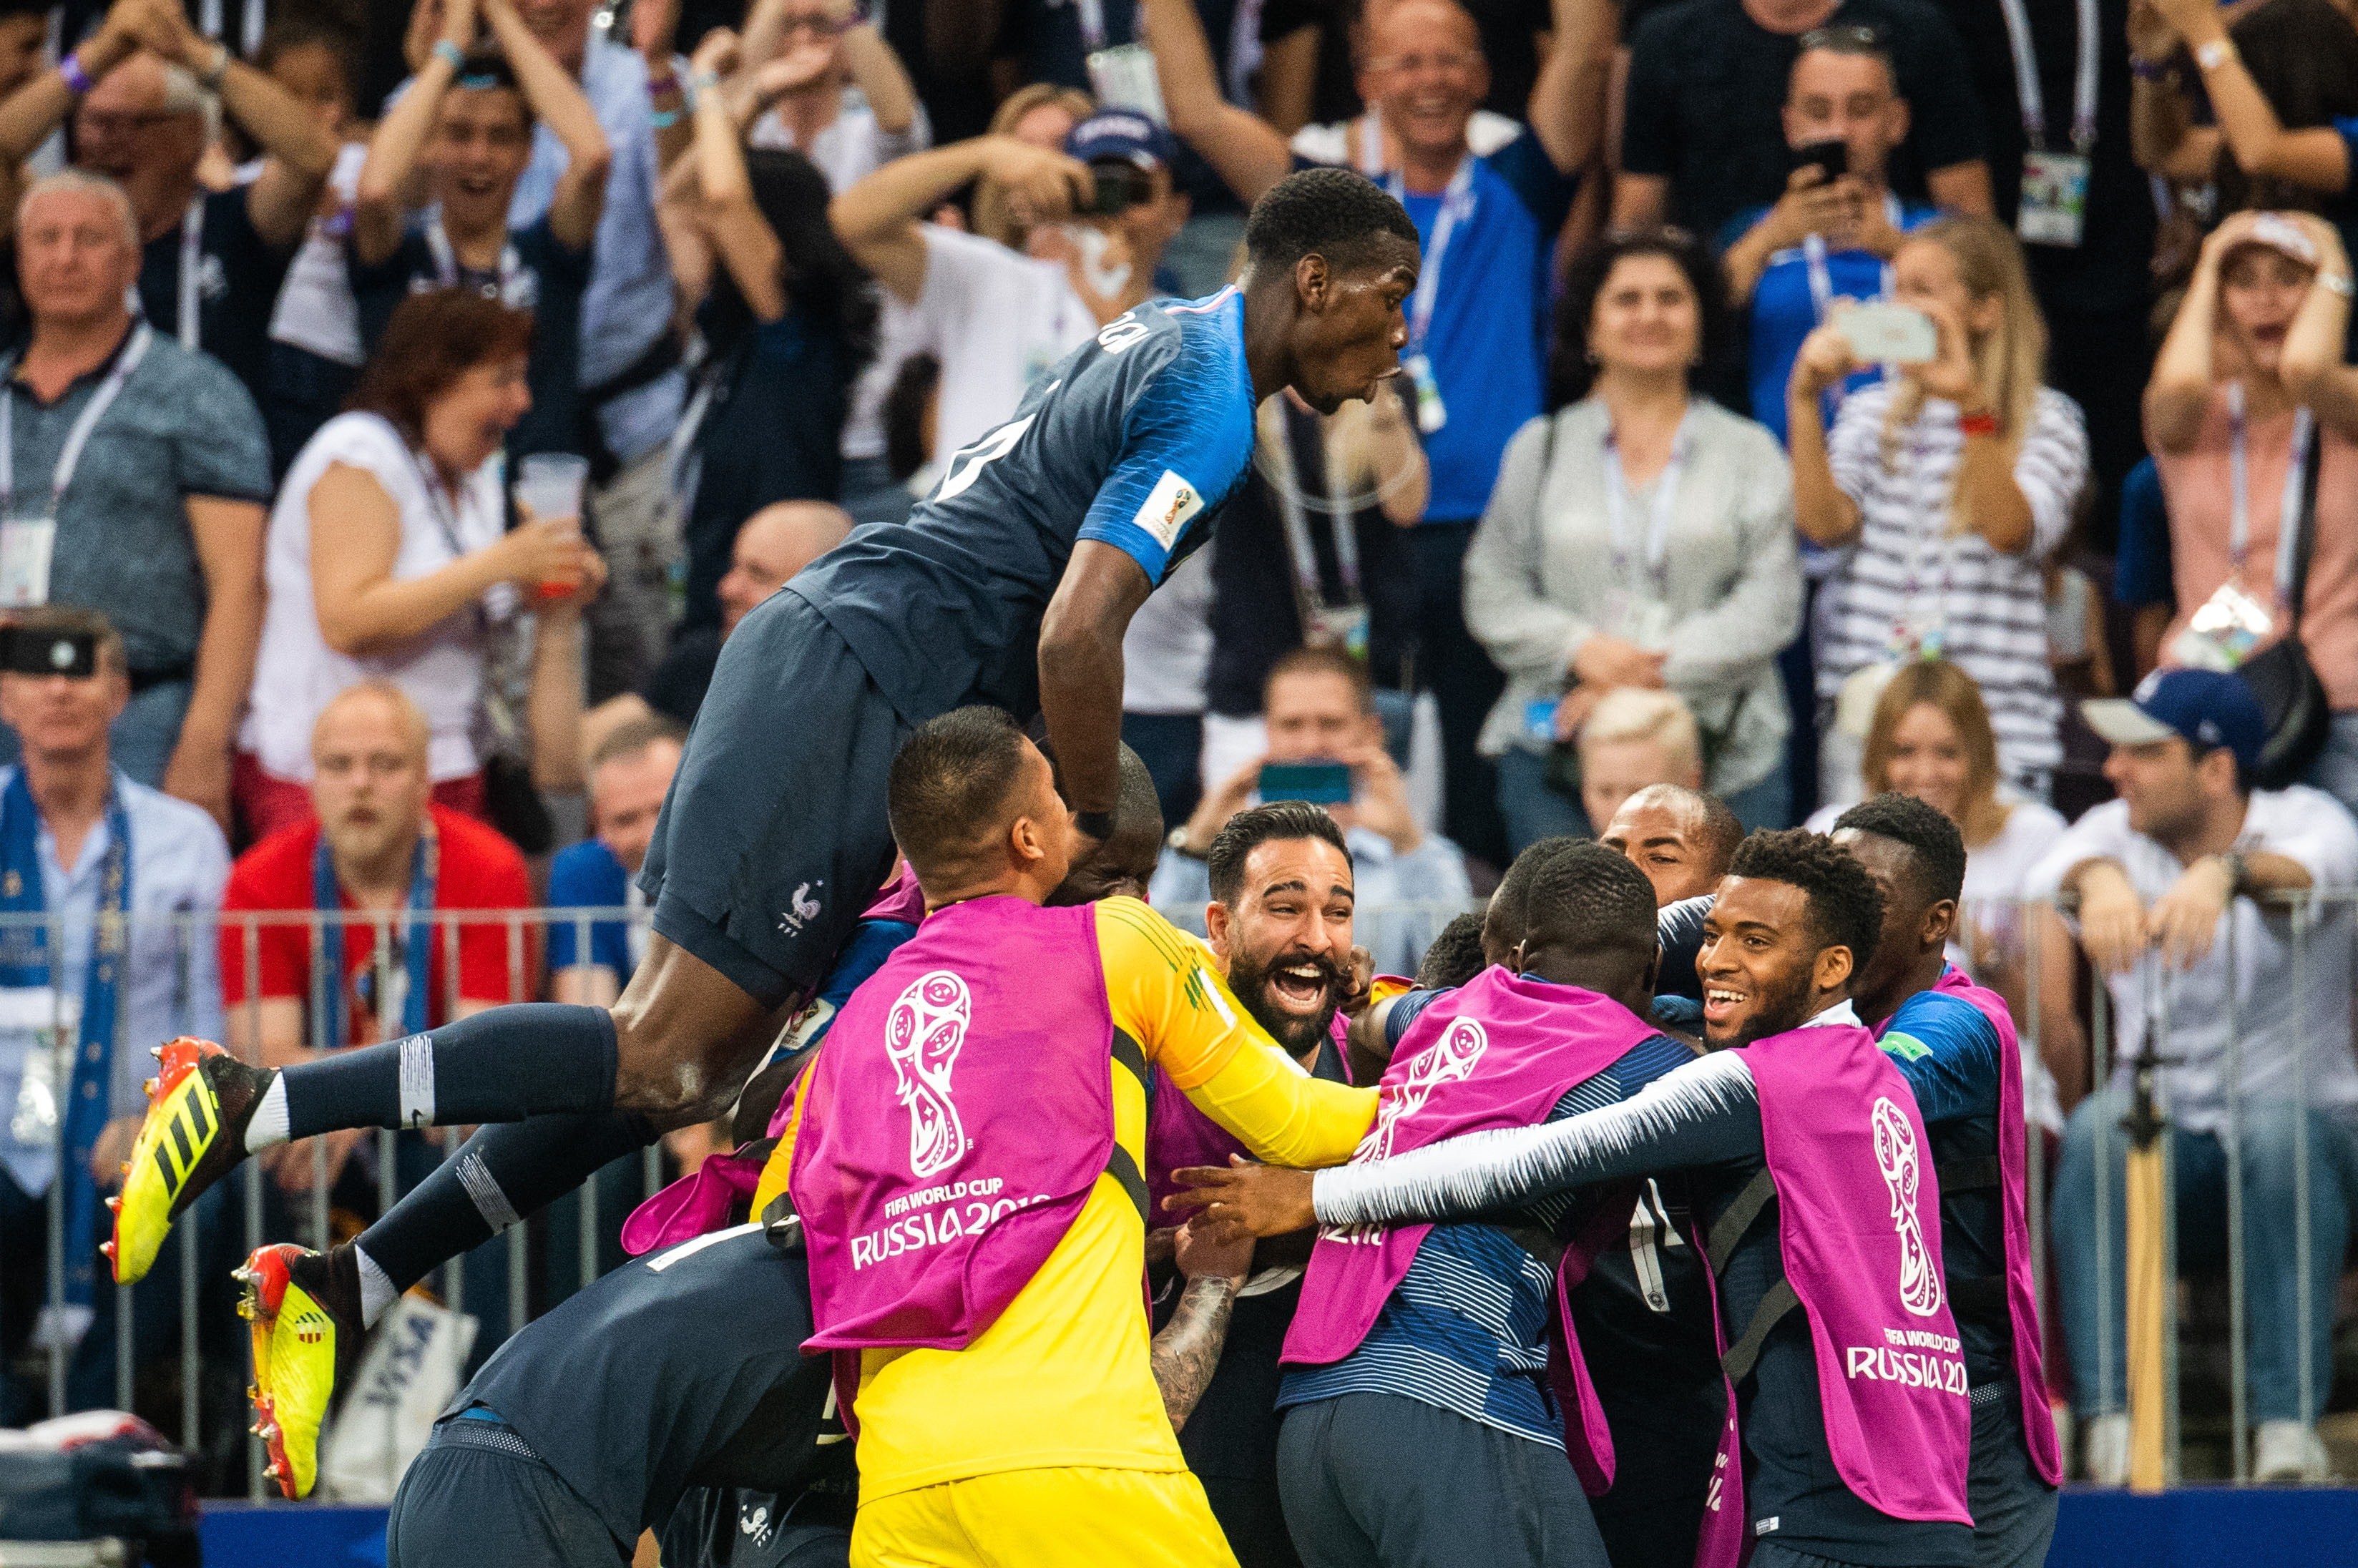 Vive la France! (pics+vids) - Sportime.GR